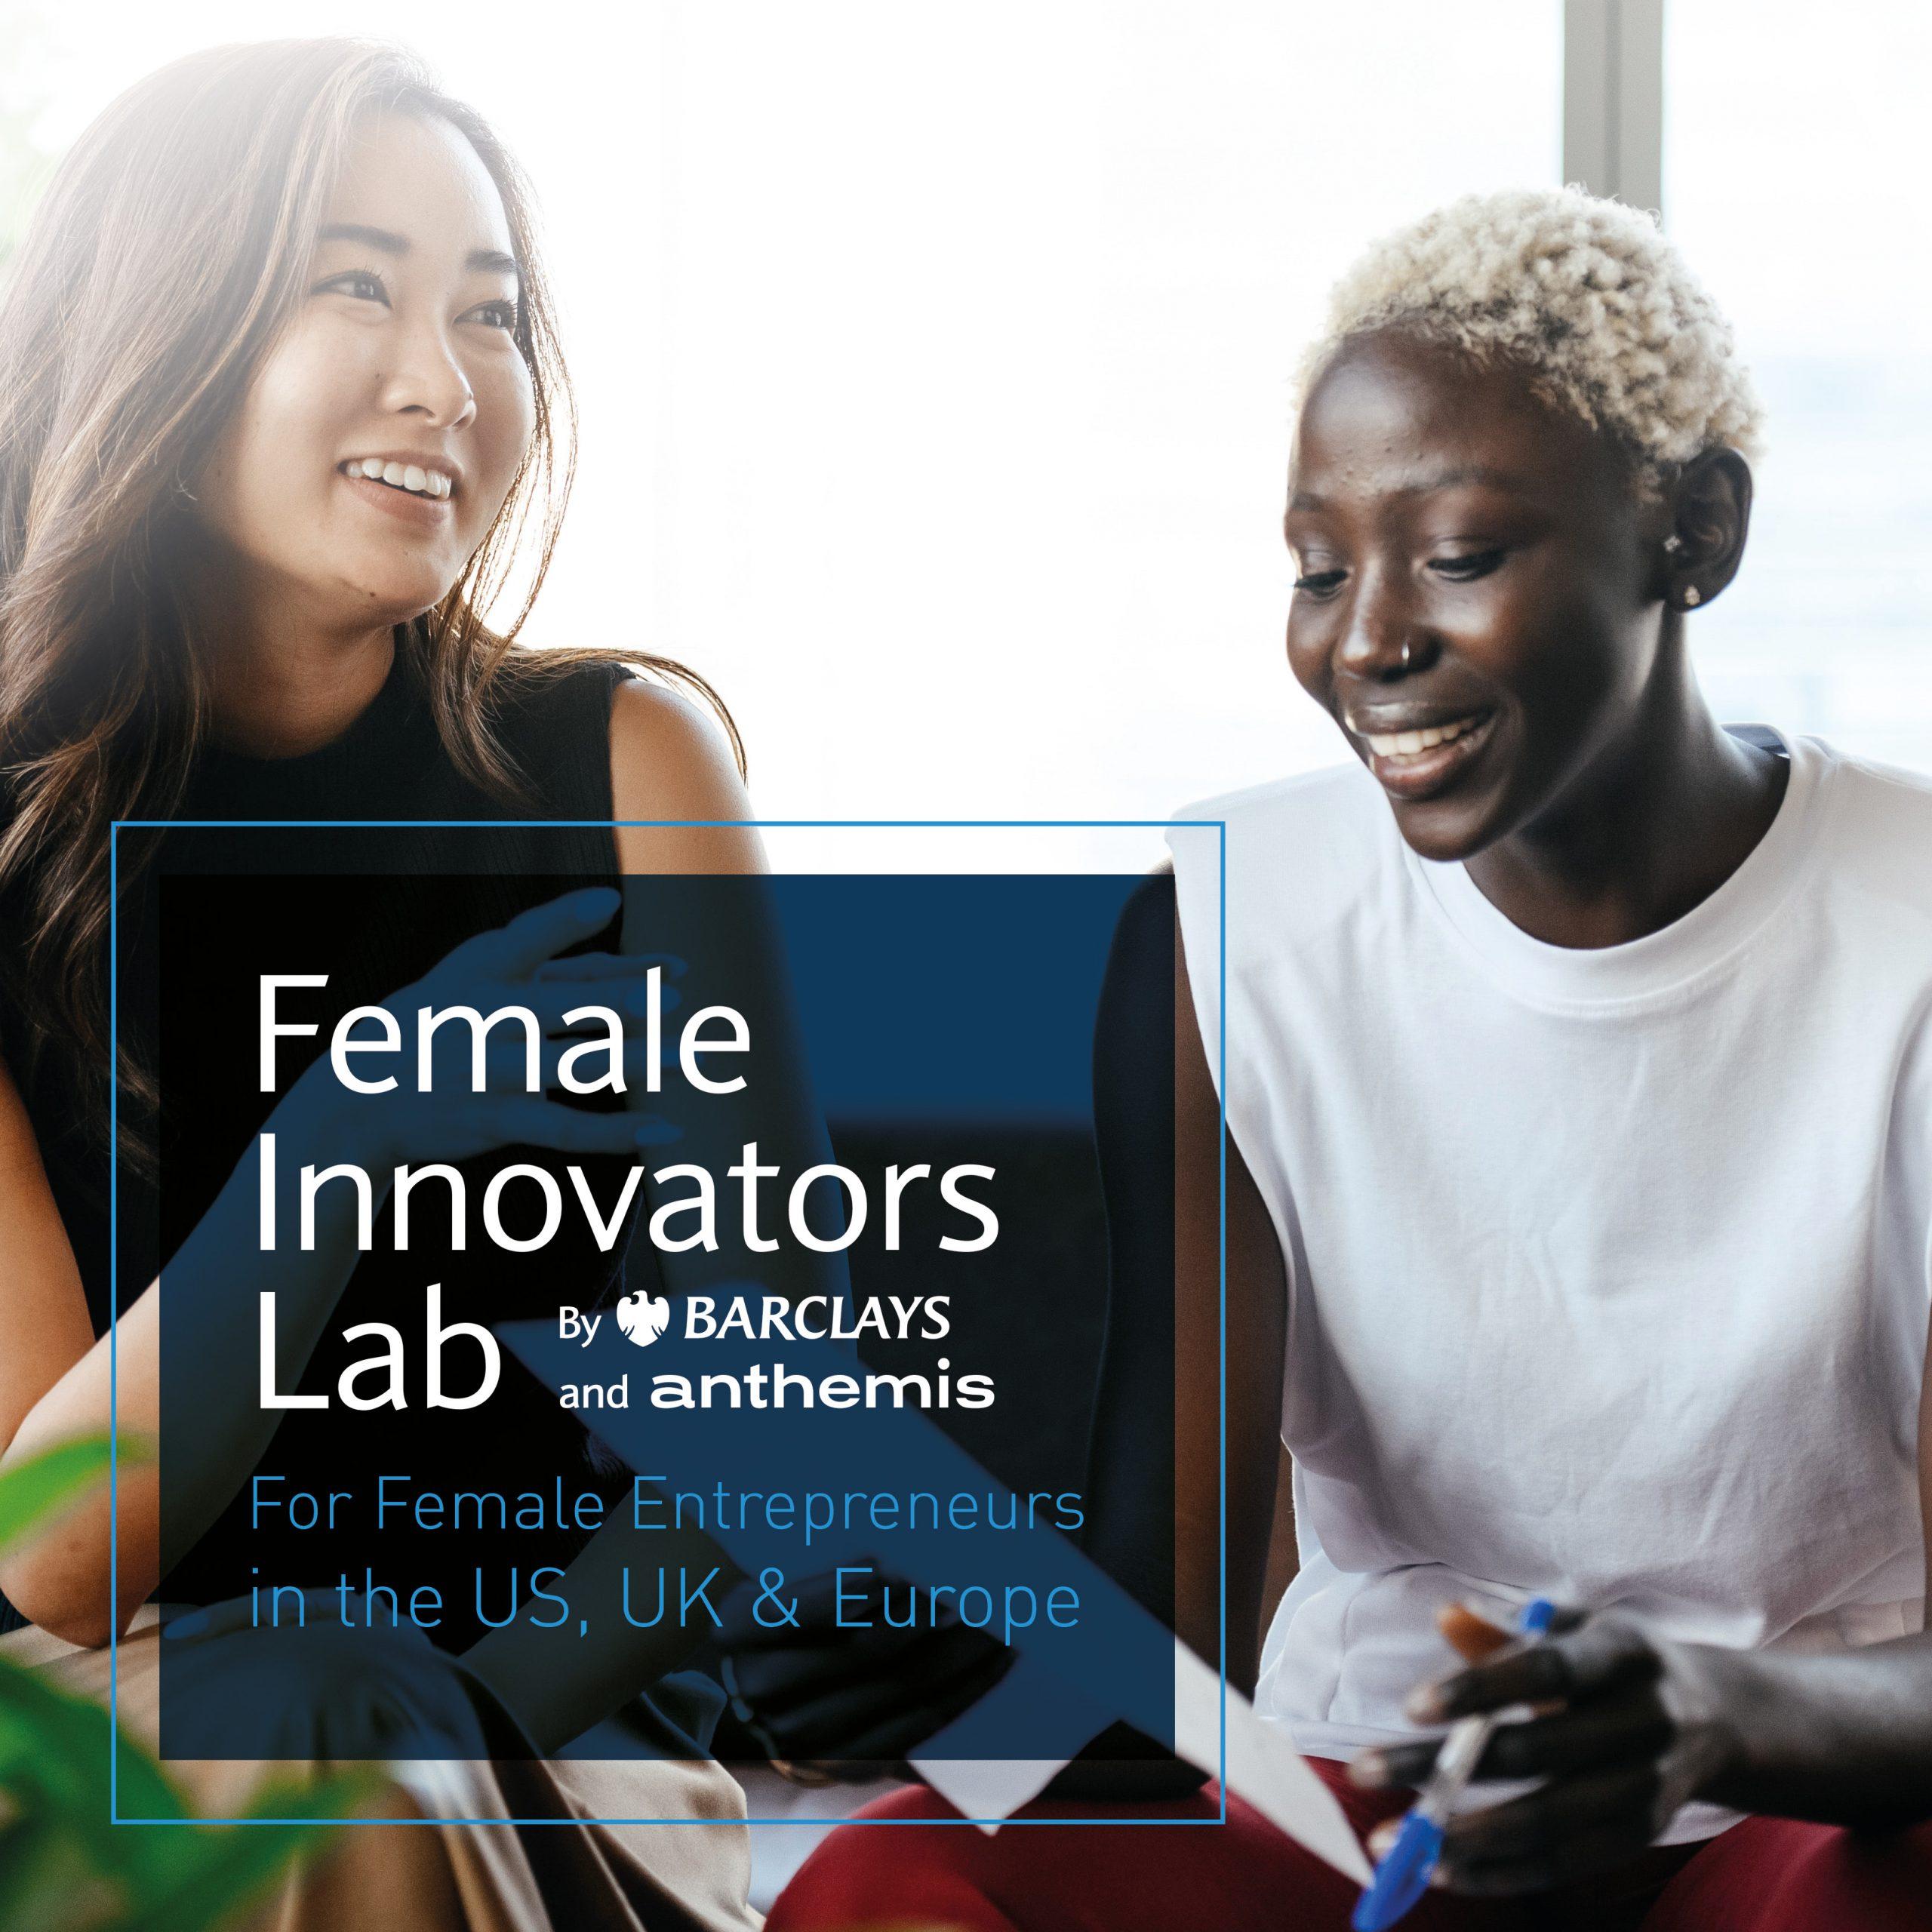 Female Innovator (LinkedIn)